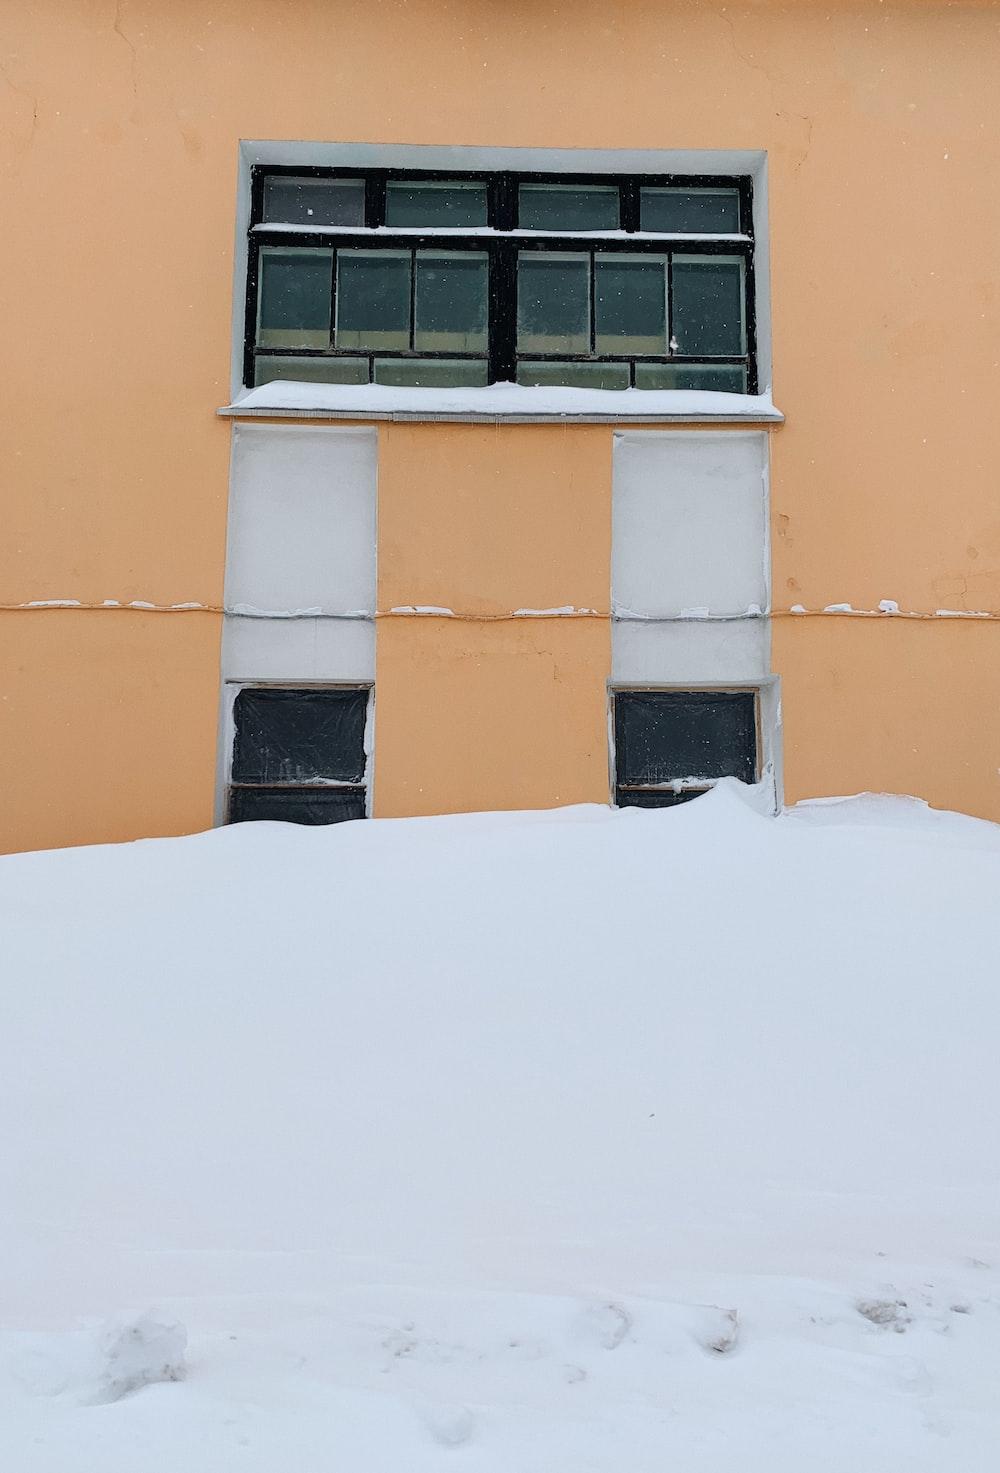 orange concrete building with black window frame